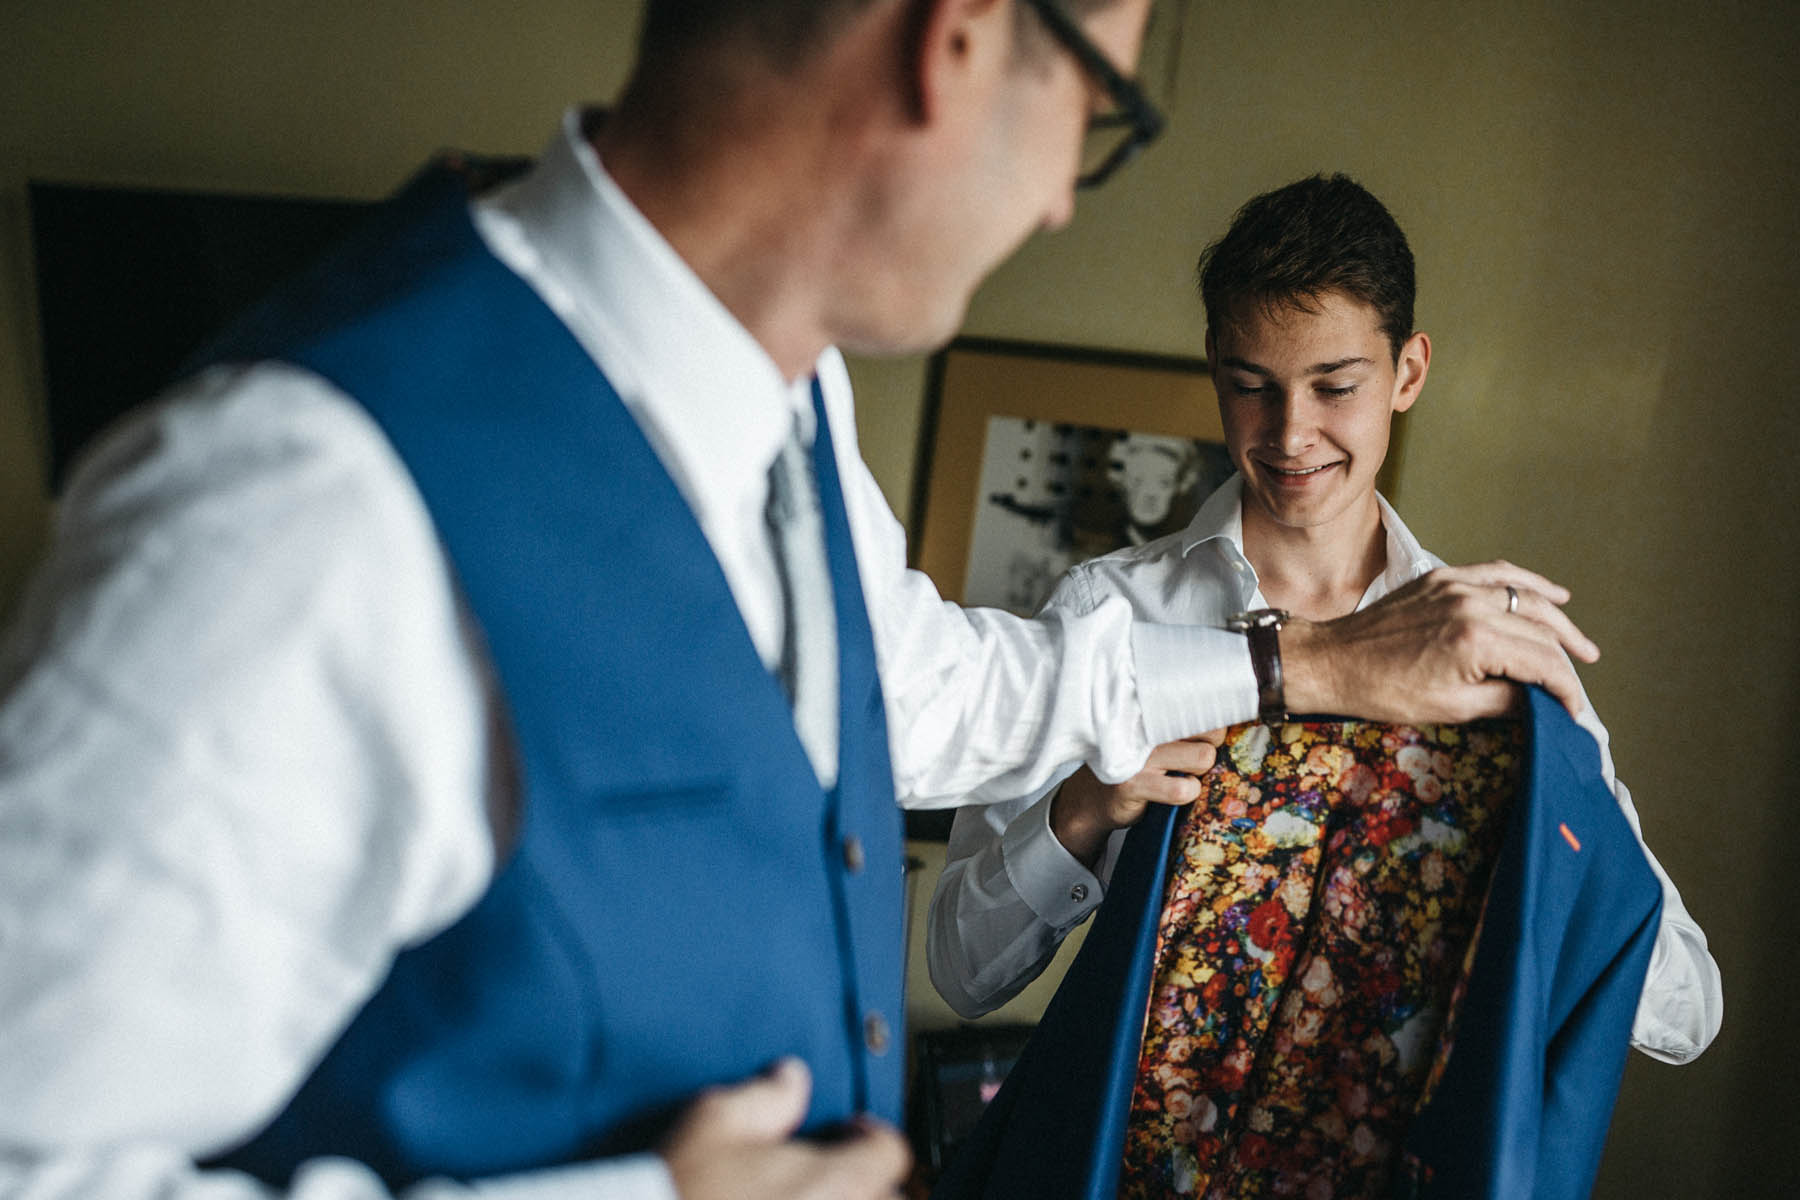 Bräutigam beim Getting Ready - Raissa + Simon Fotografie